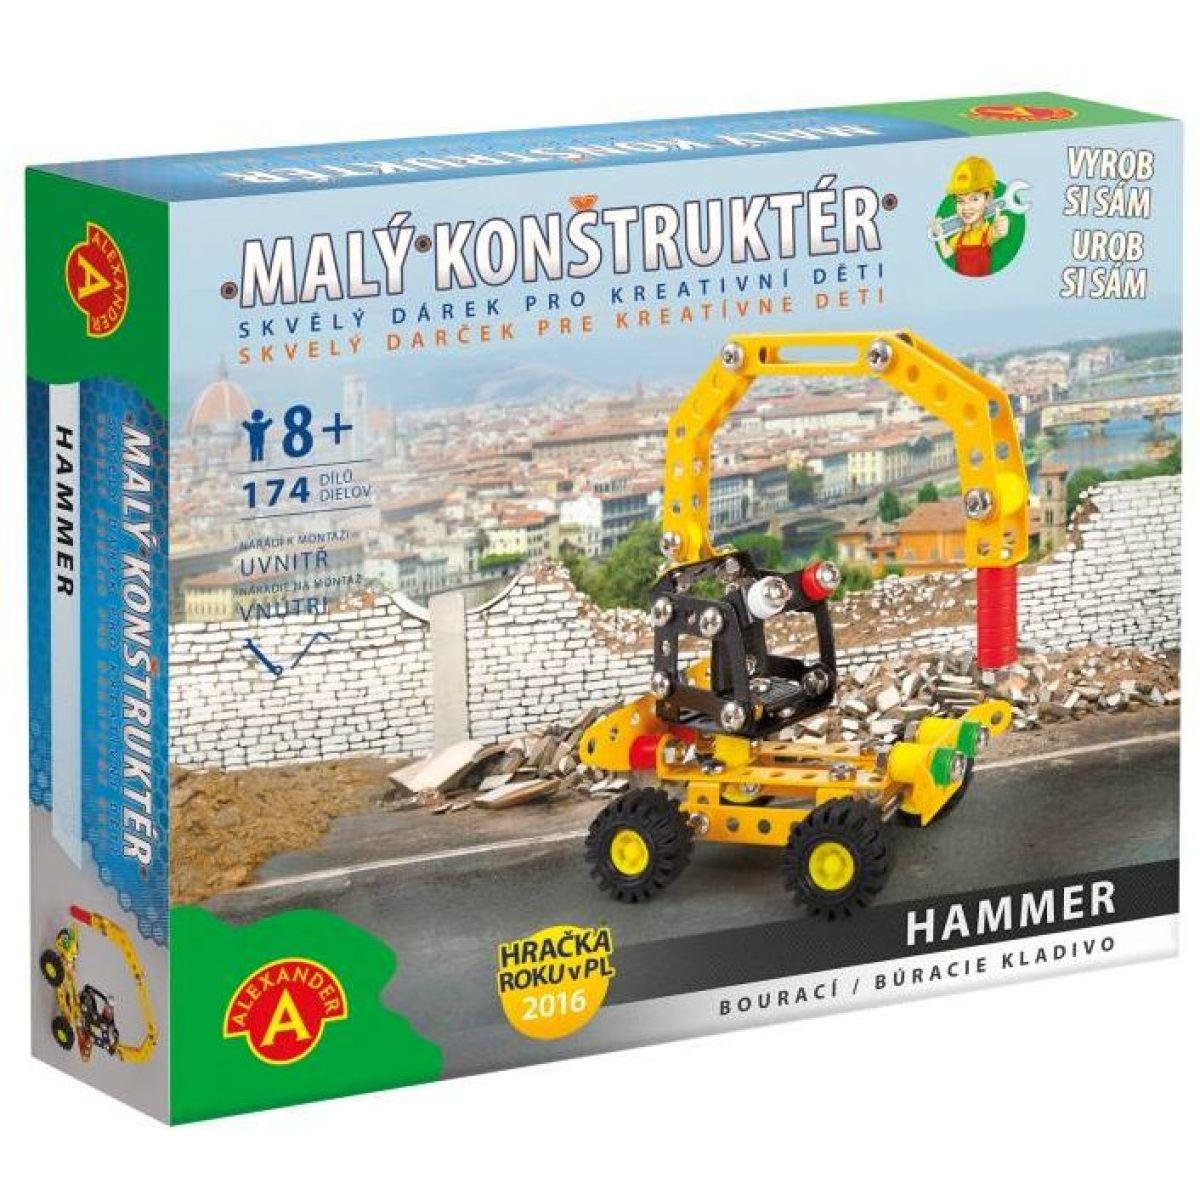 Alexander Malý konstruktér Hammer Bourací kladivo